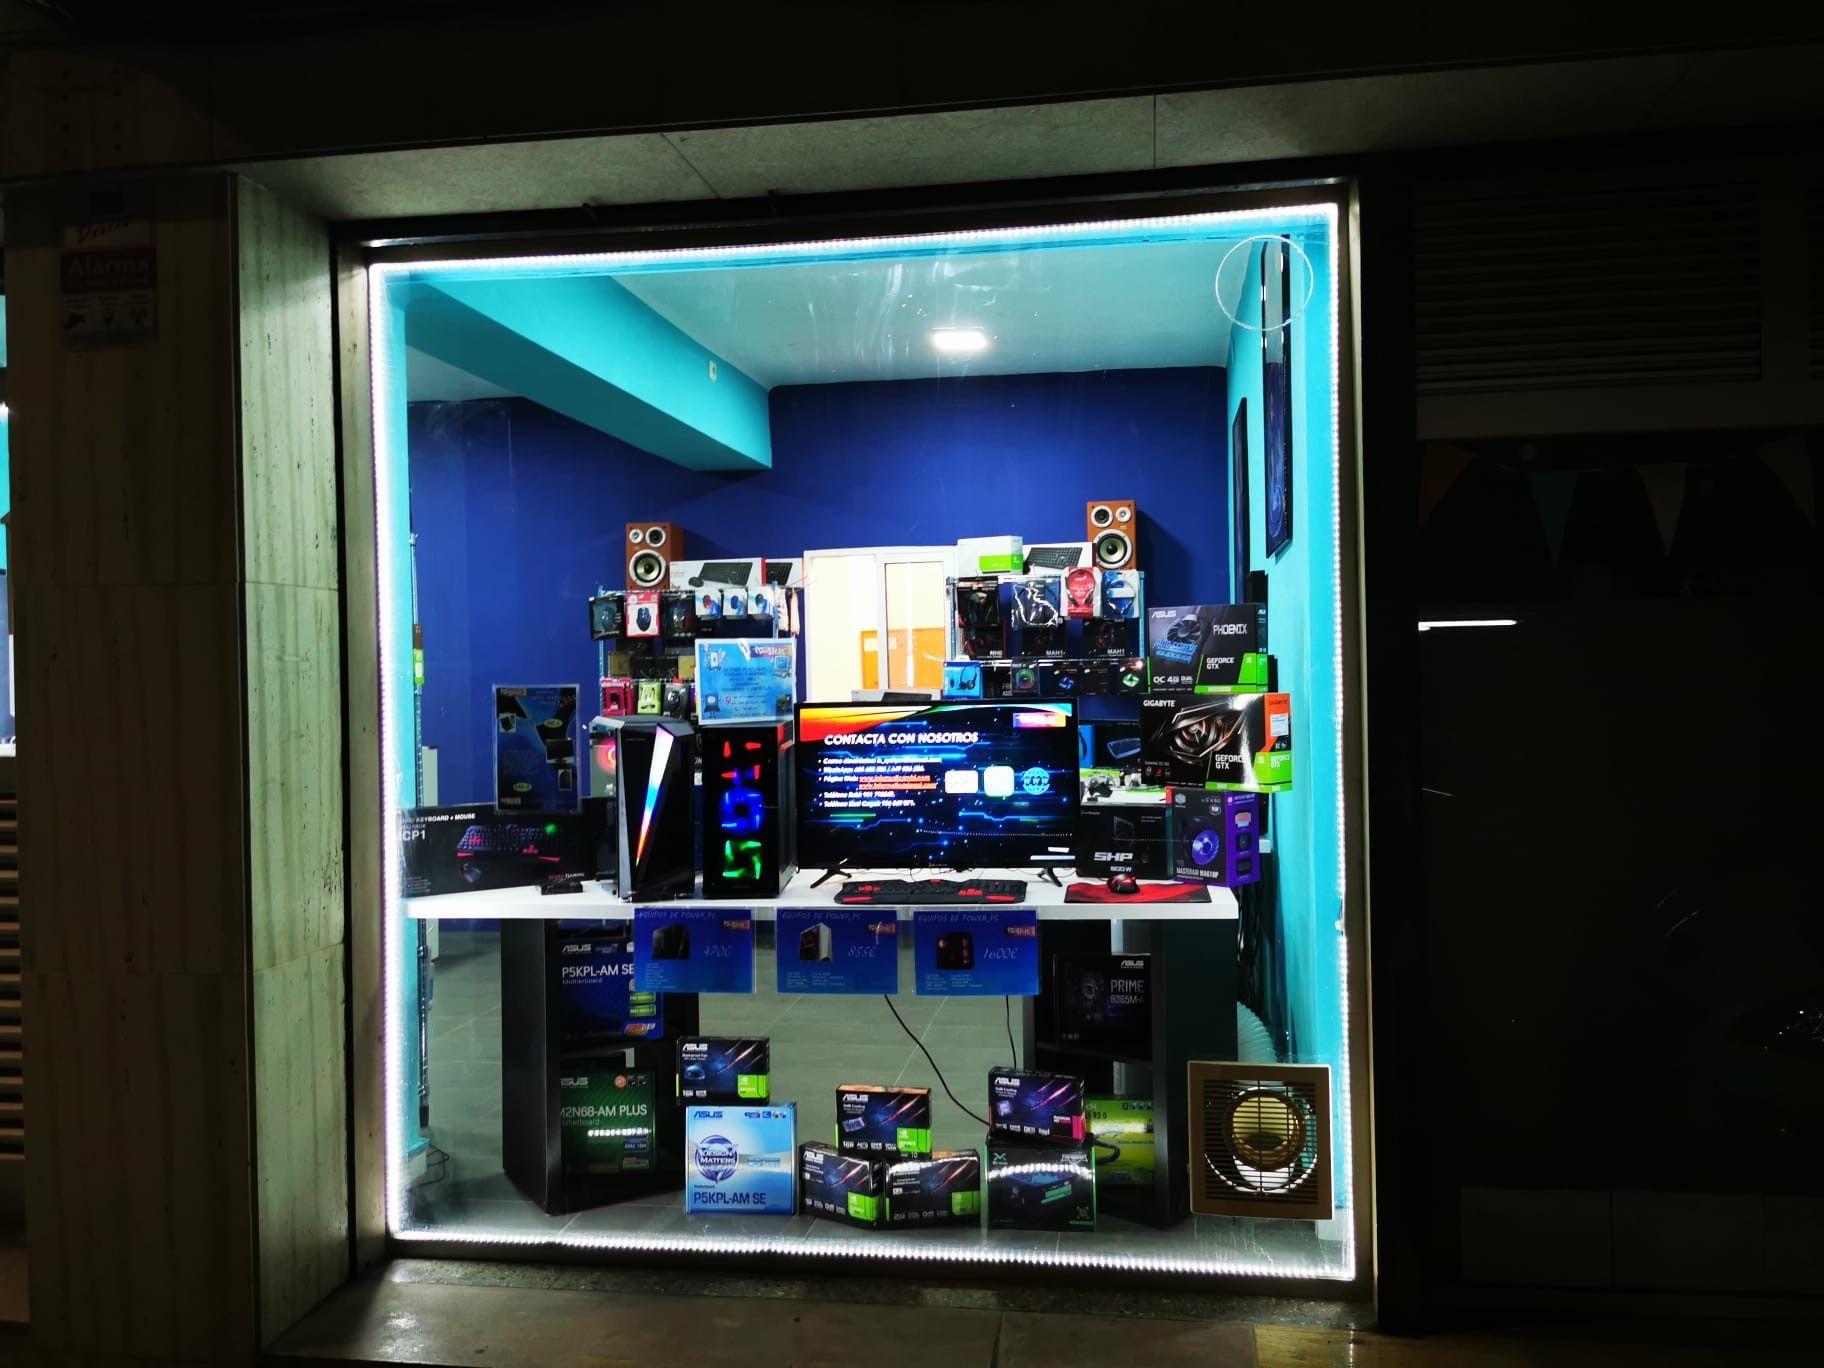 Aparador de la botiga informàtica POWER PC. FOTO: Cedida